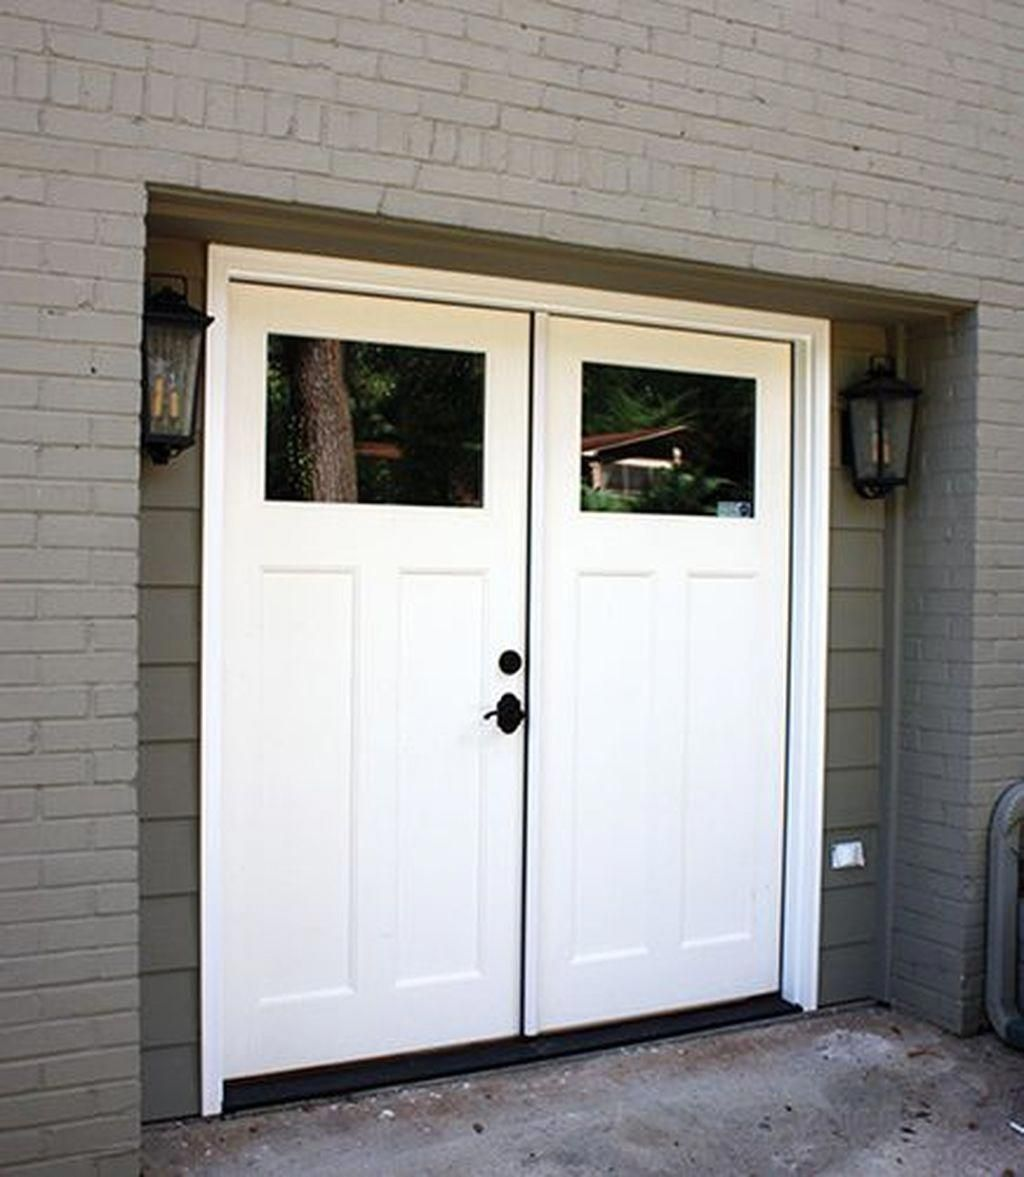 I Appreciate This Fantastic Double Garage Doors Doublegaragedoors Doors Double Doublegaragedoors Fantast In 2020 Garage Door Design Double Garage Door Garage Doors